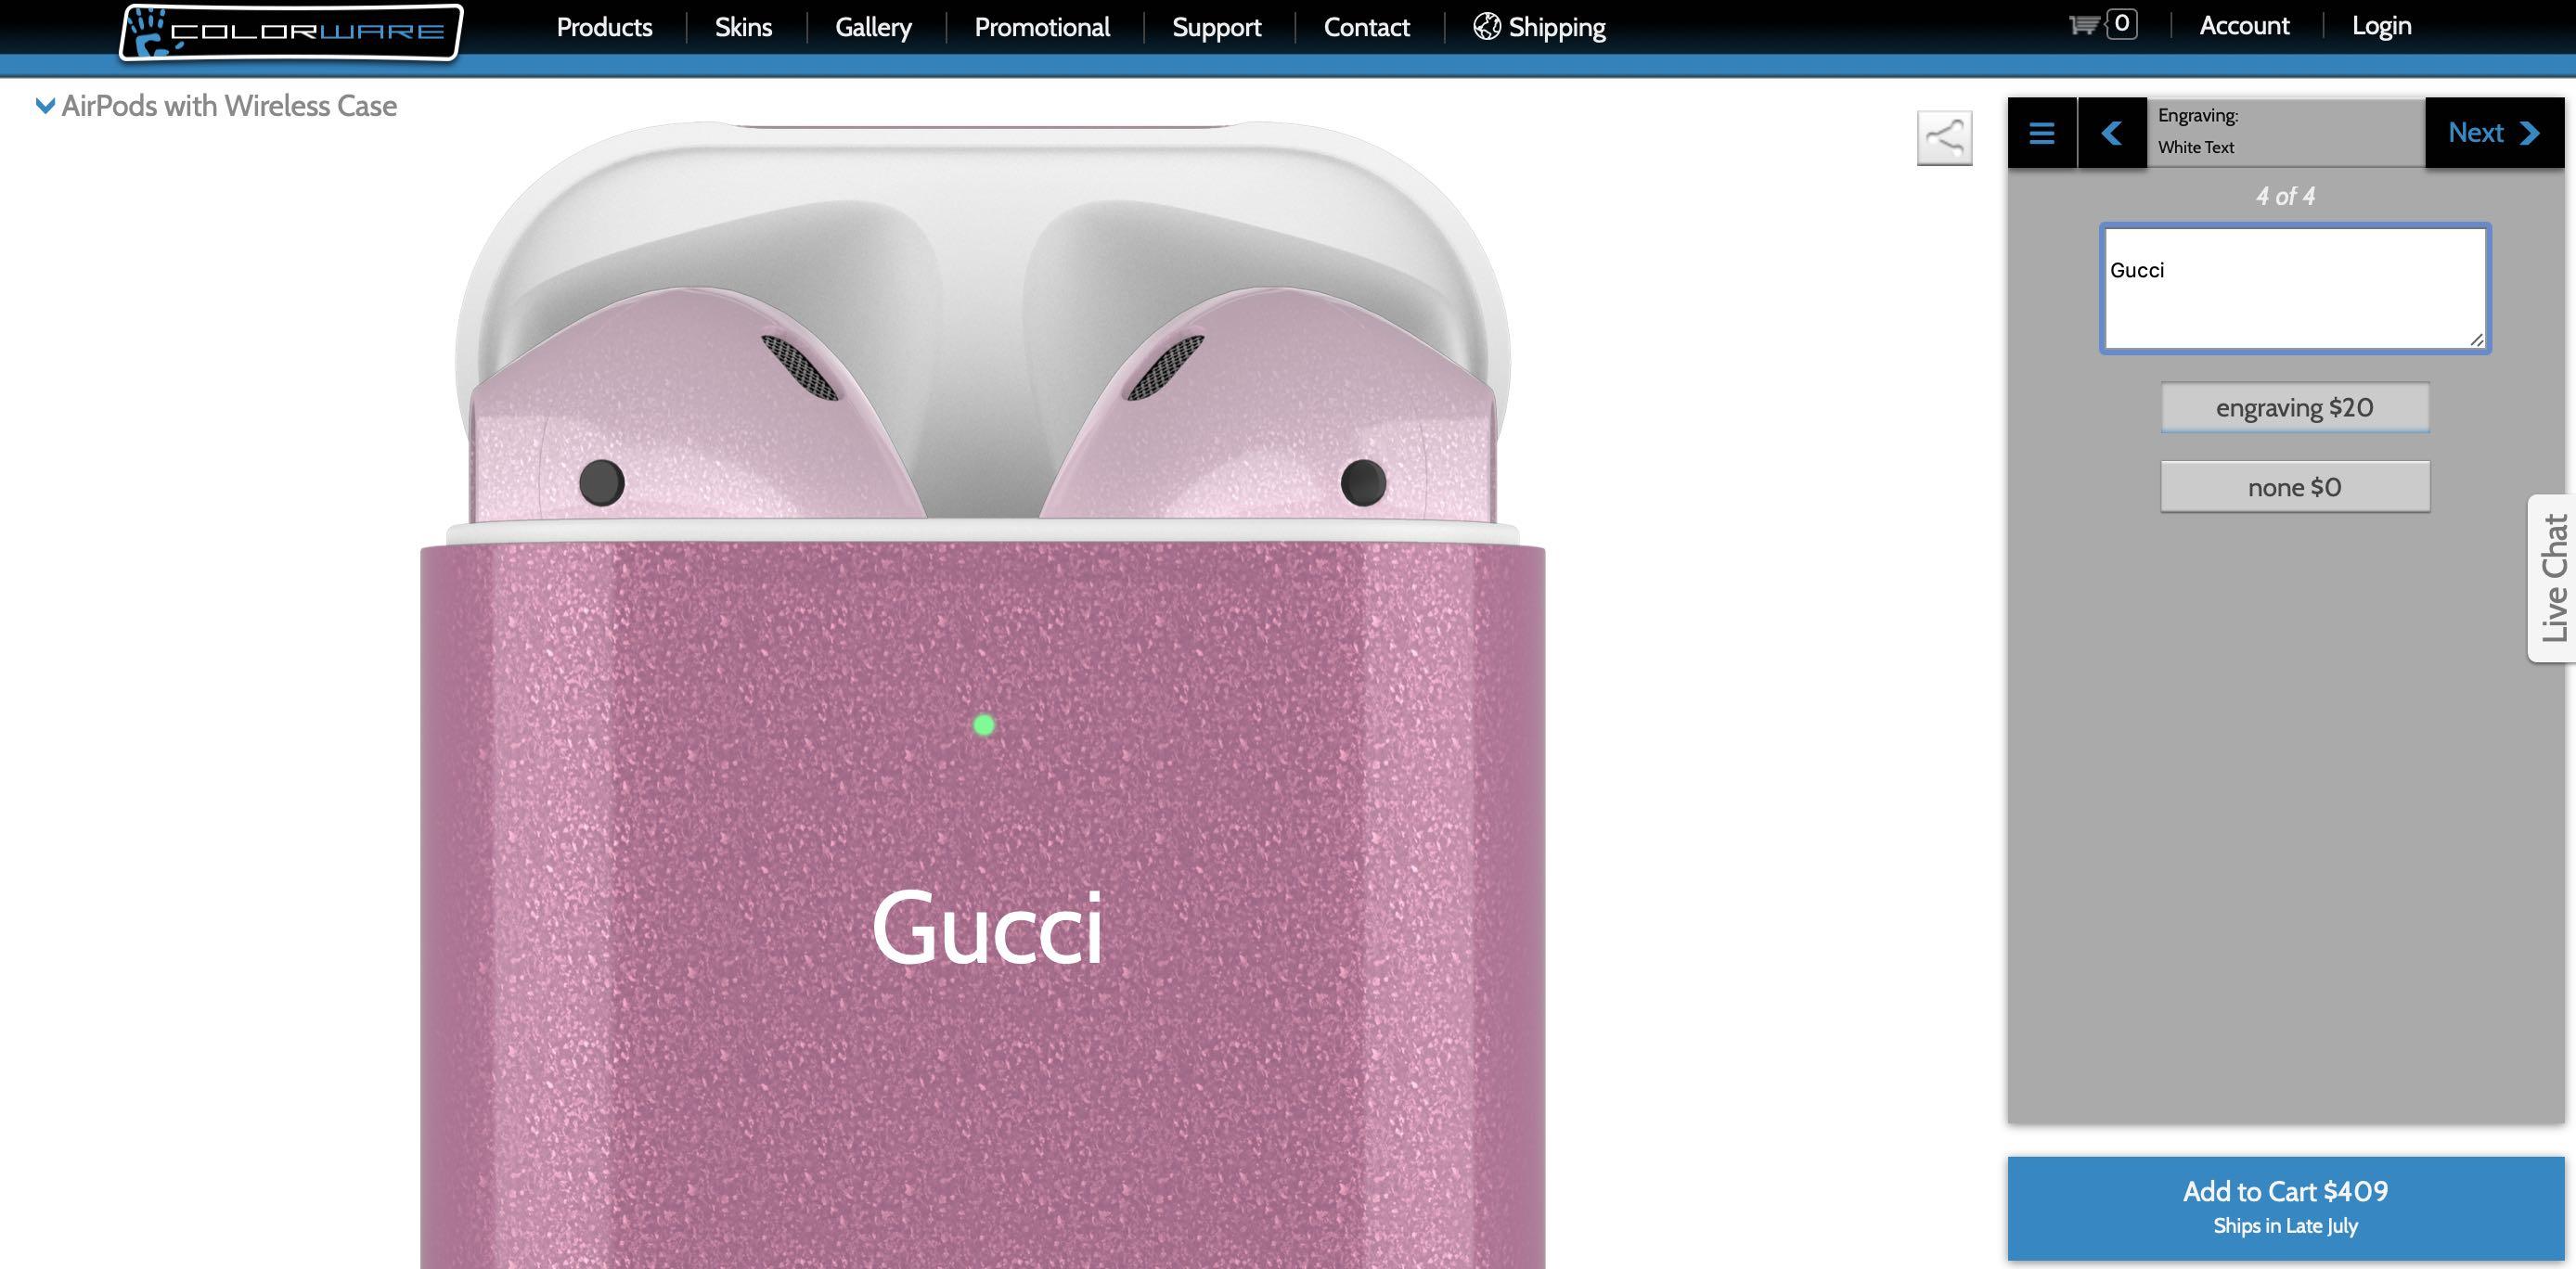 customized airpods case gucci